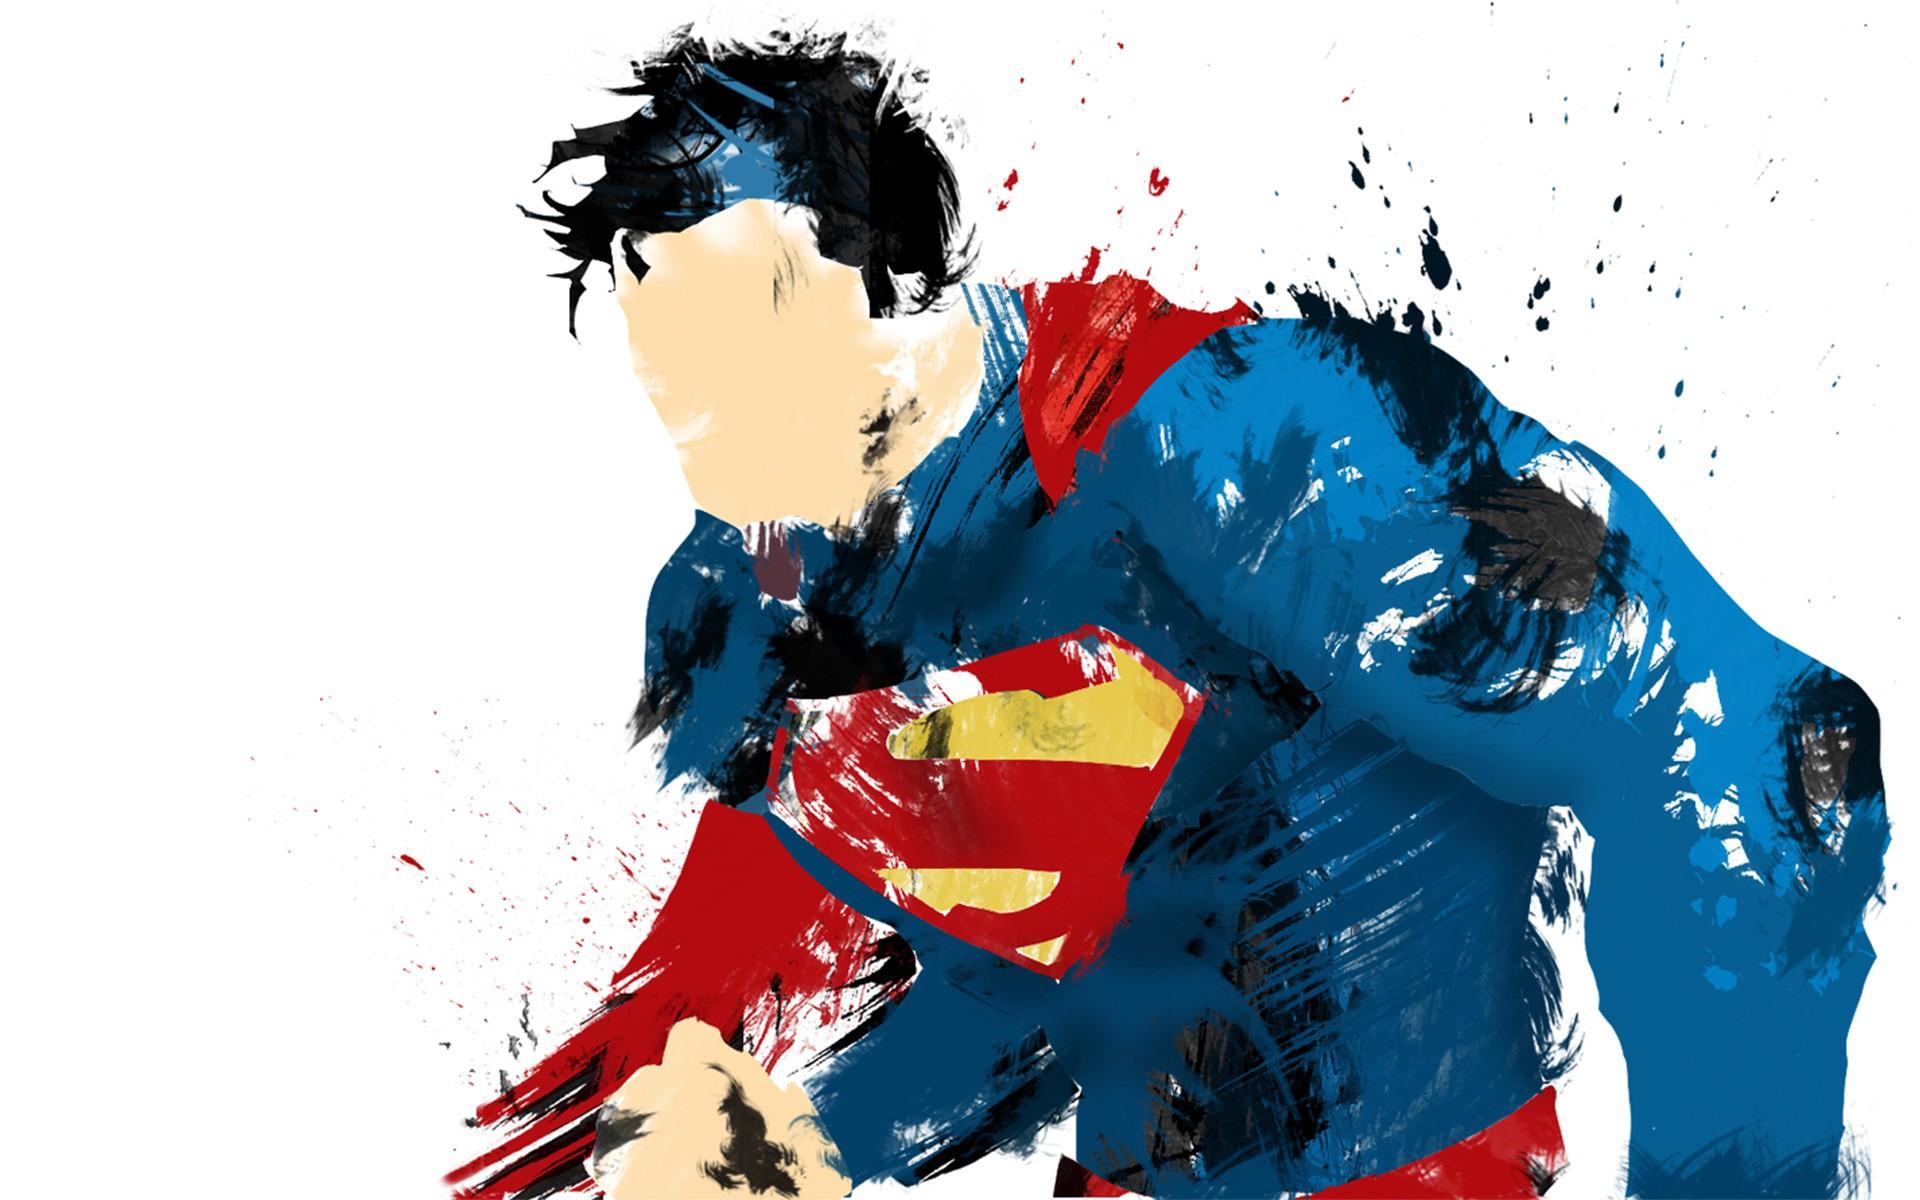 Superman Super Hero Painting White Background Artwork